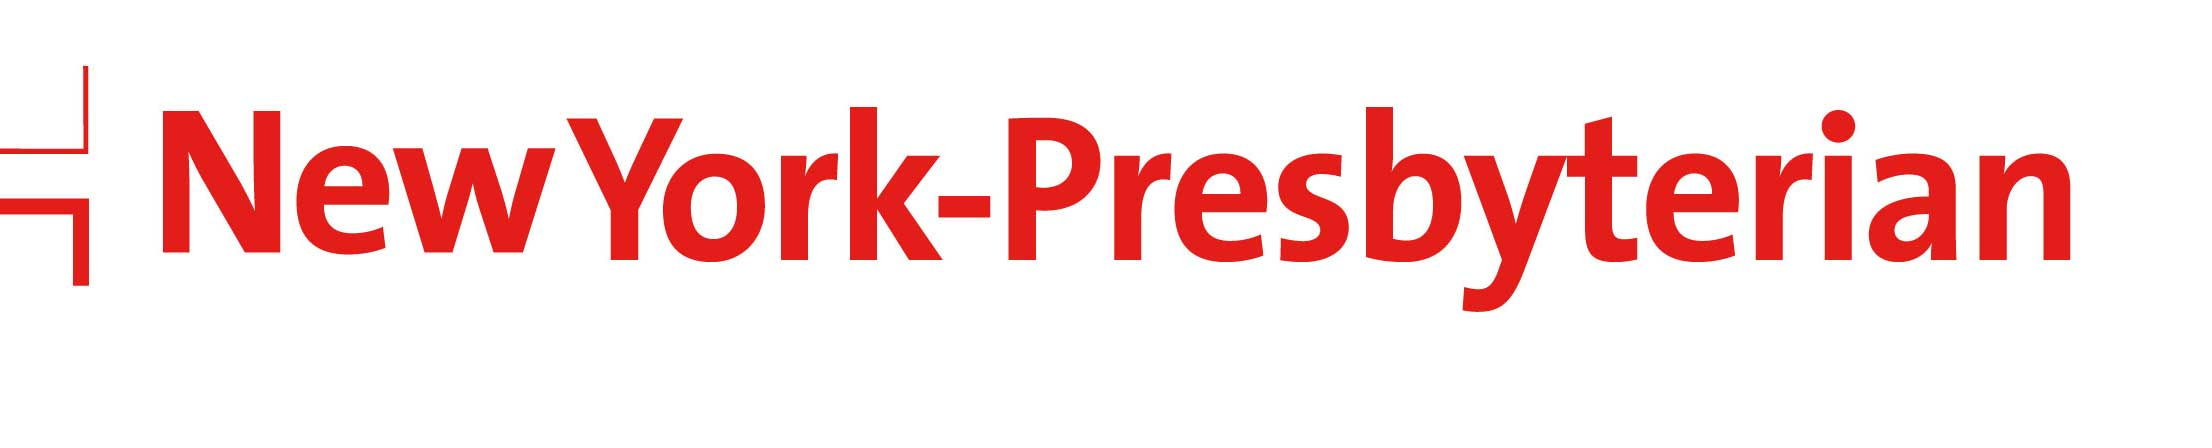 NY presbyterian logo.jpg